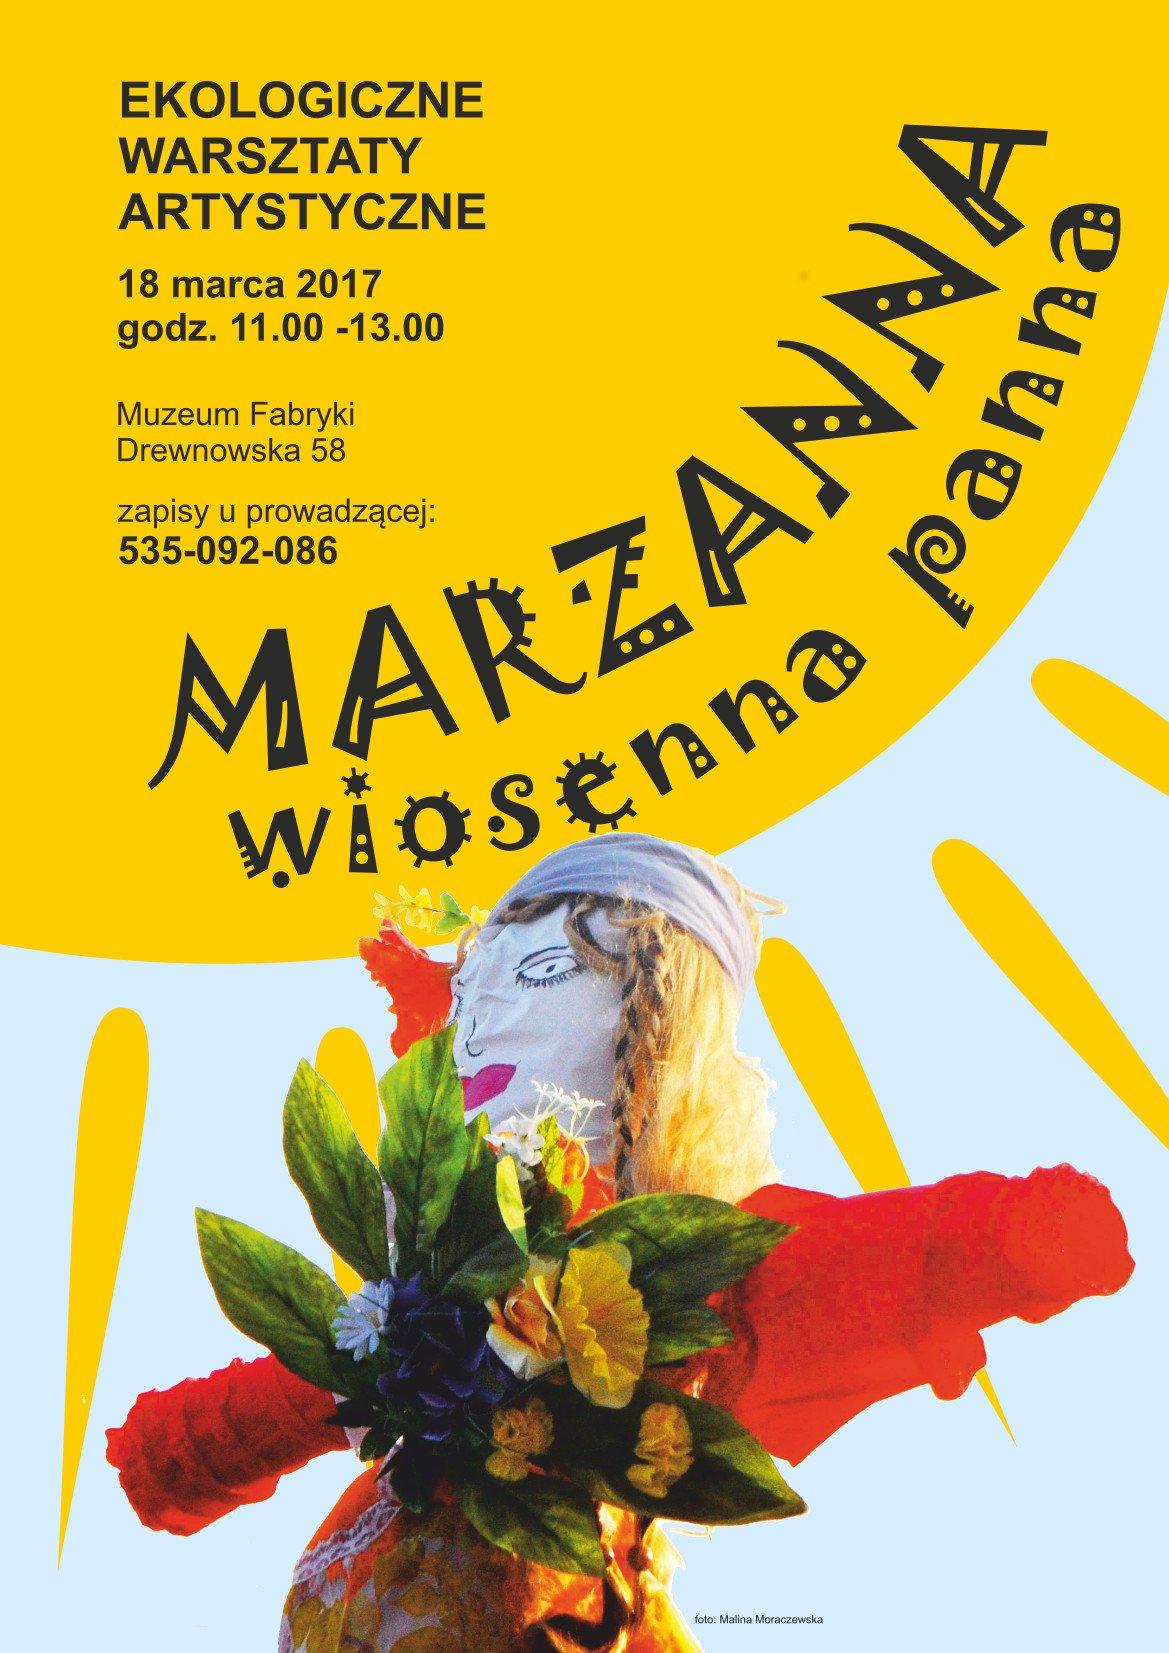 muzeum fabryki marzanna wiosenna panna